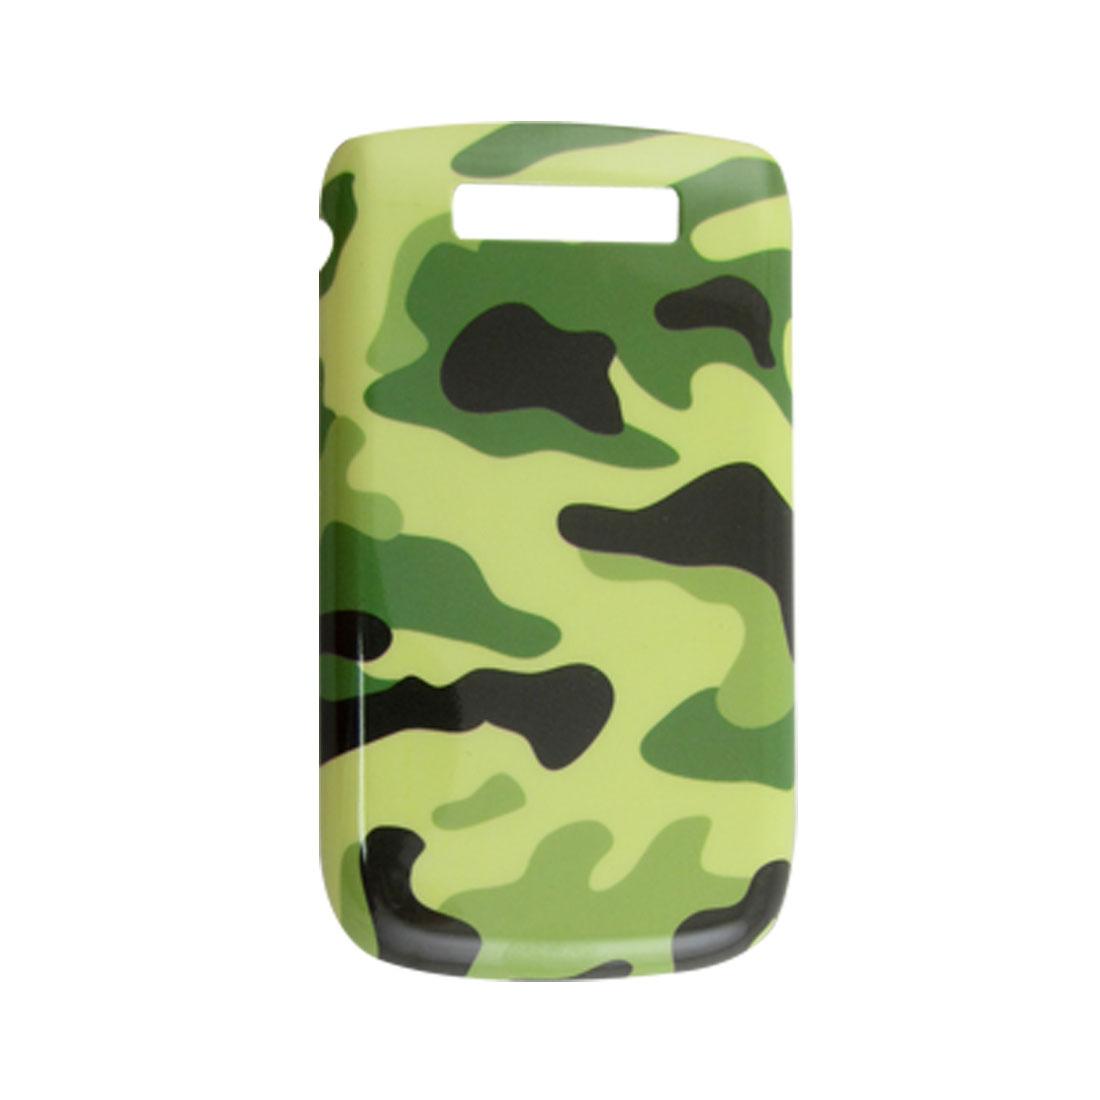 Camouflage Pattern Hard Plastic Back Case for Blackberry 9800